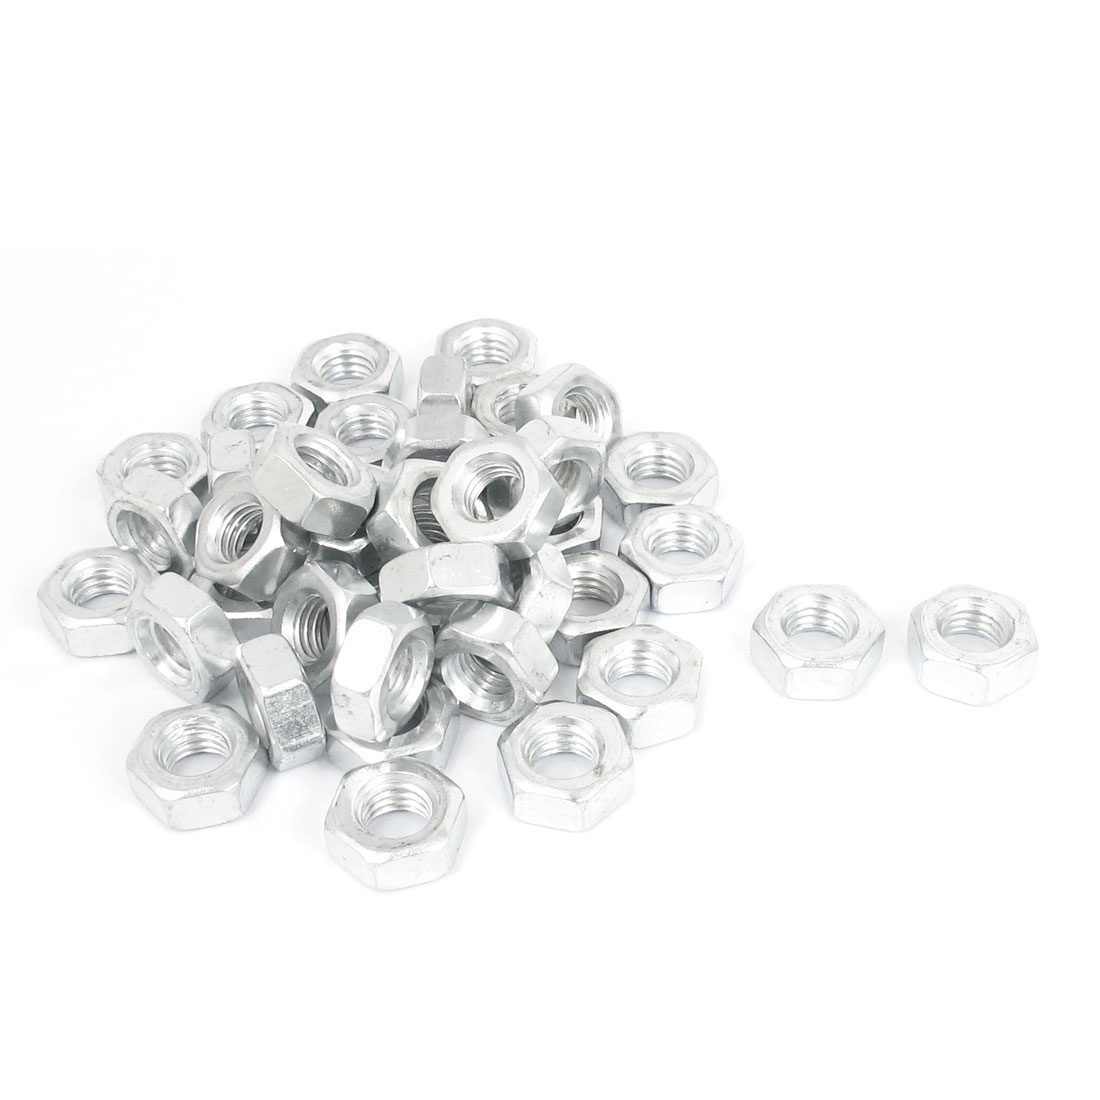 40 Pcs M10 Metal Machine Screw Hex Hexagon Nut DIN934